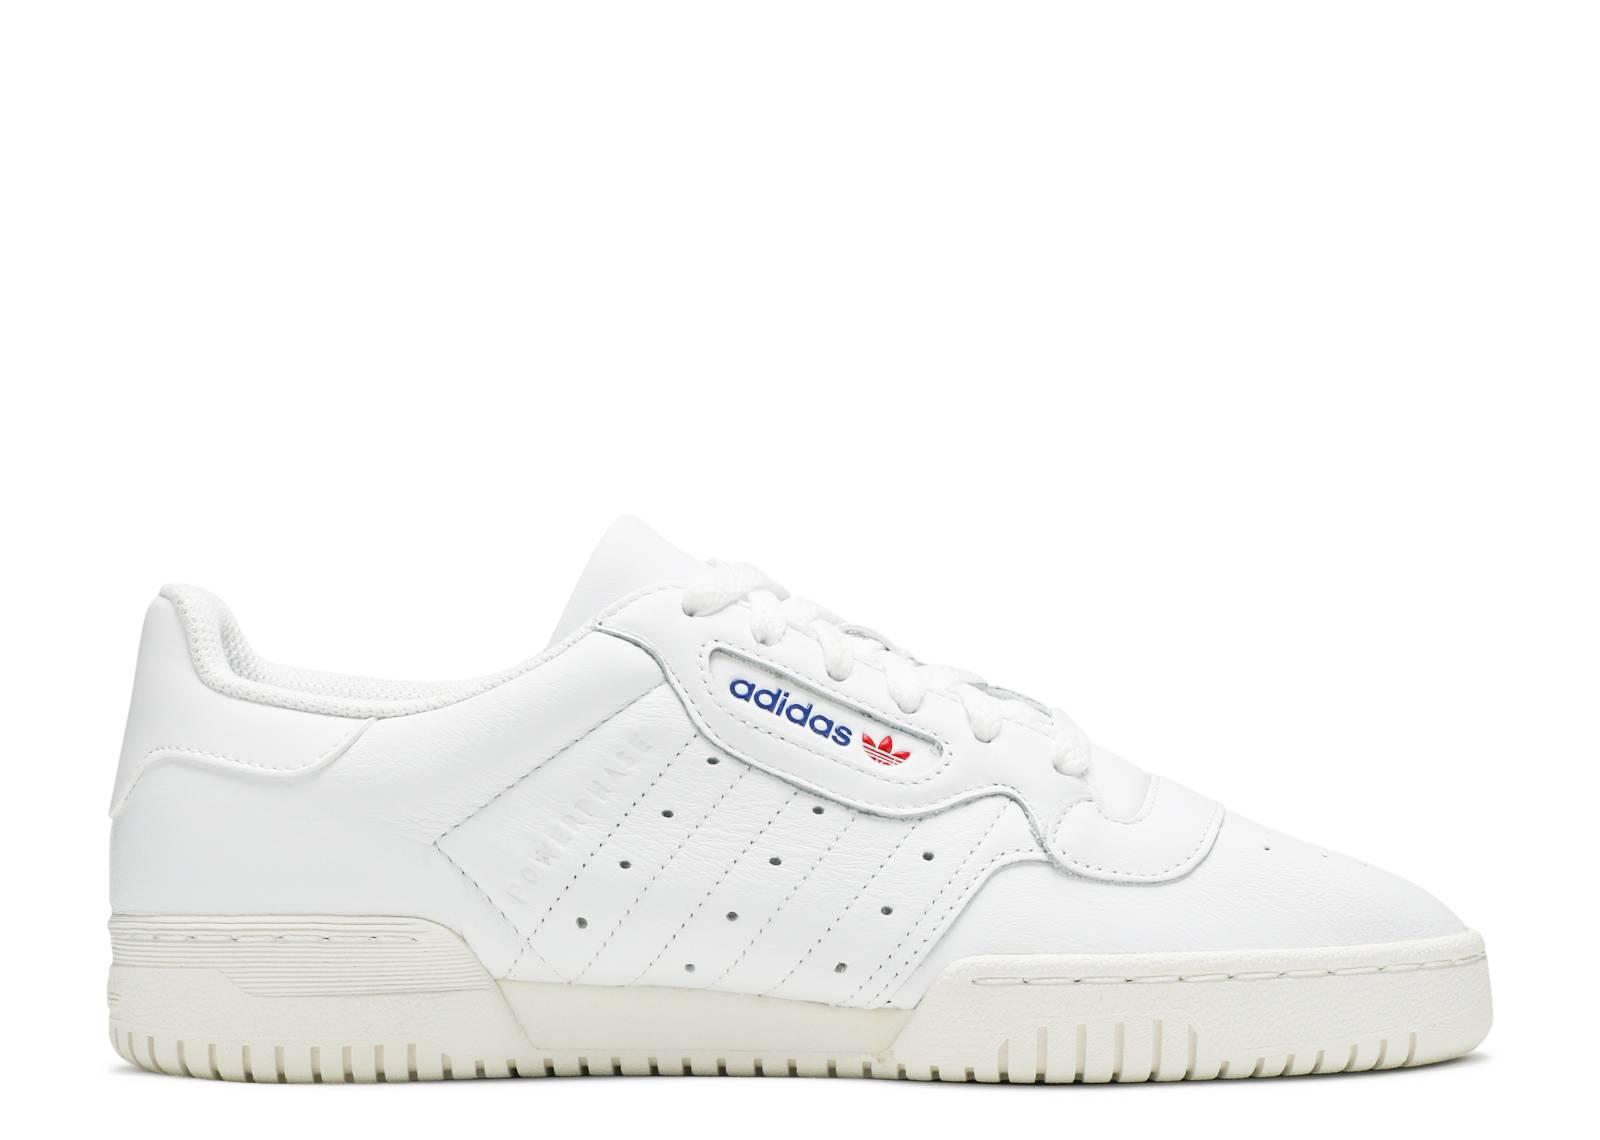 Adidas Powerphase OG White  END.